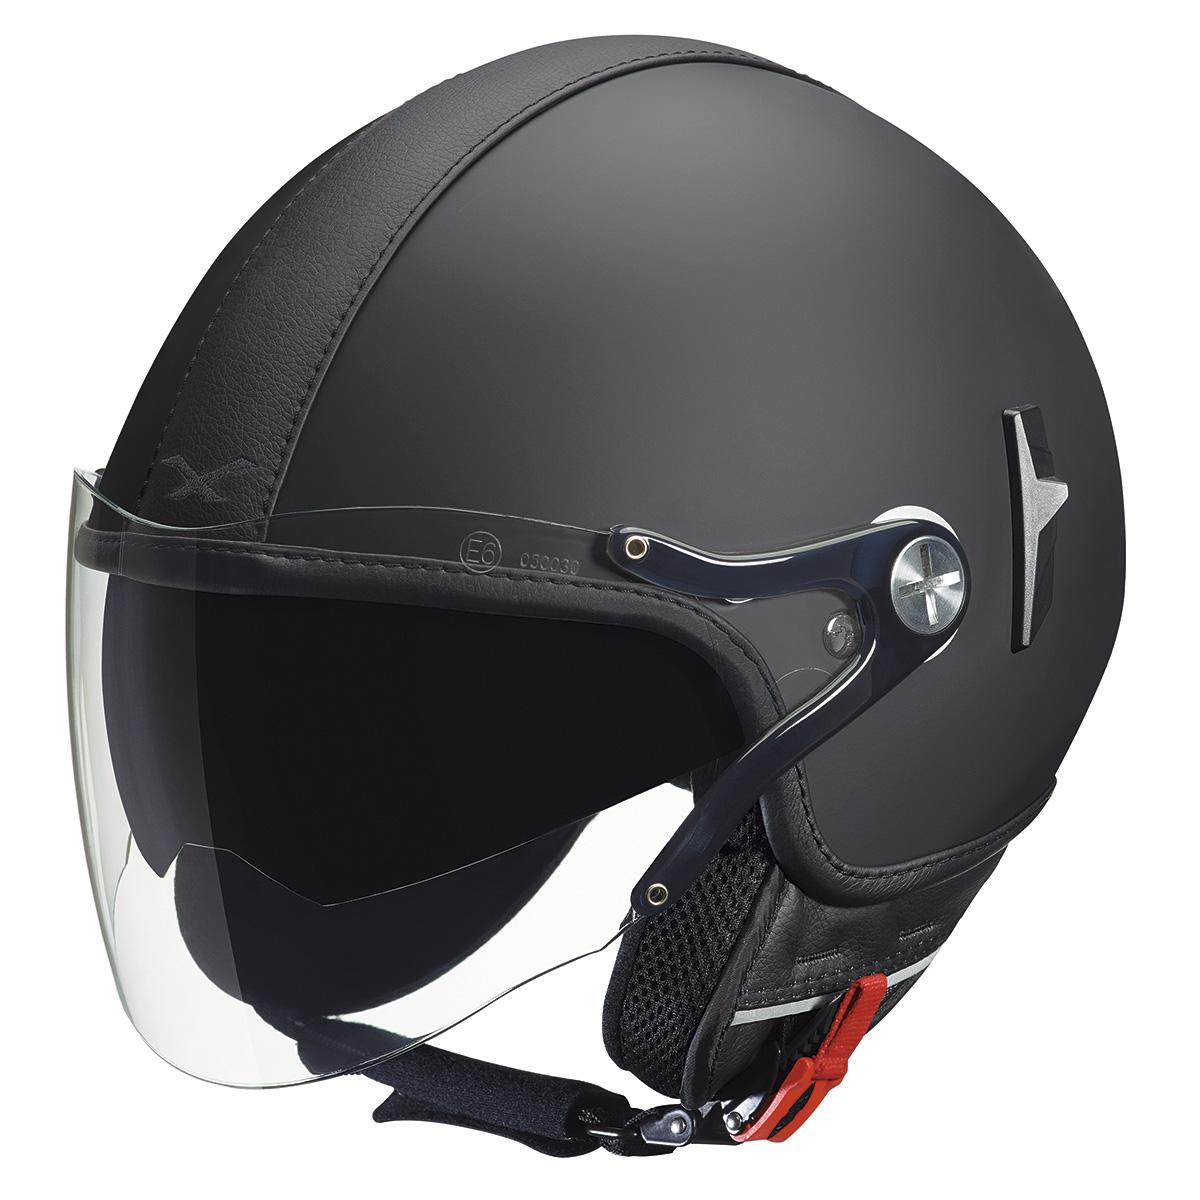 Capacete Nexx X60 Cruise Black NOVO!  - Nova Suzuki Motos e Acessórios